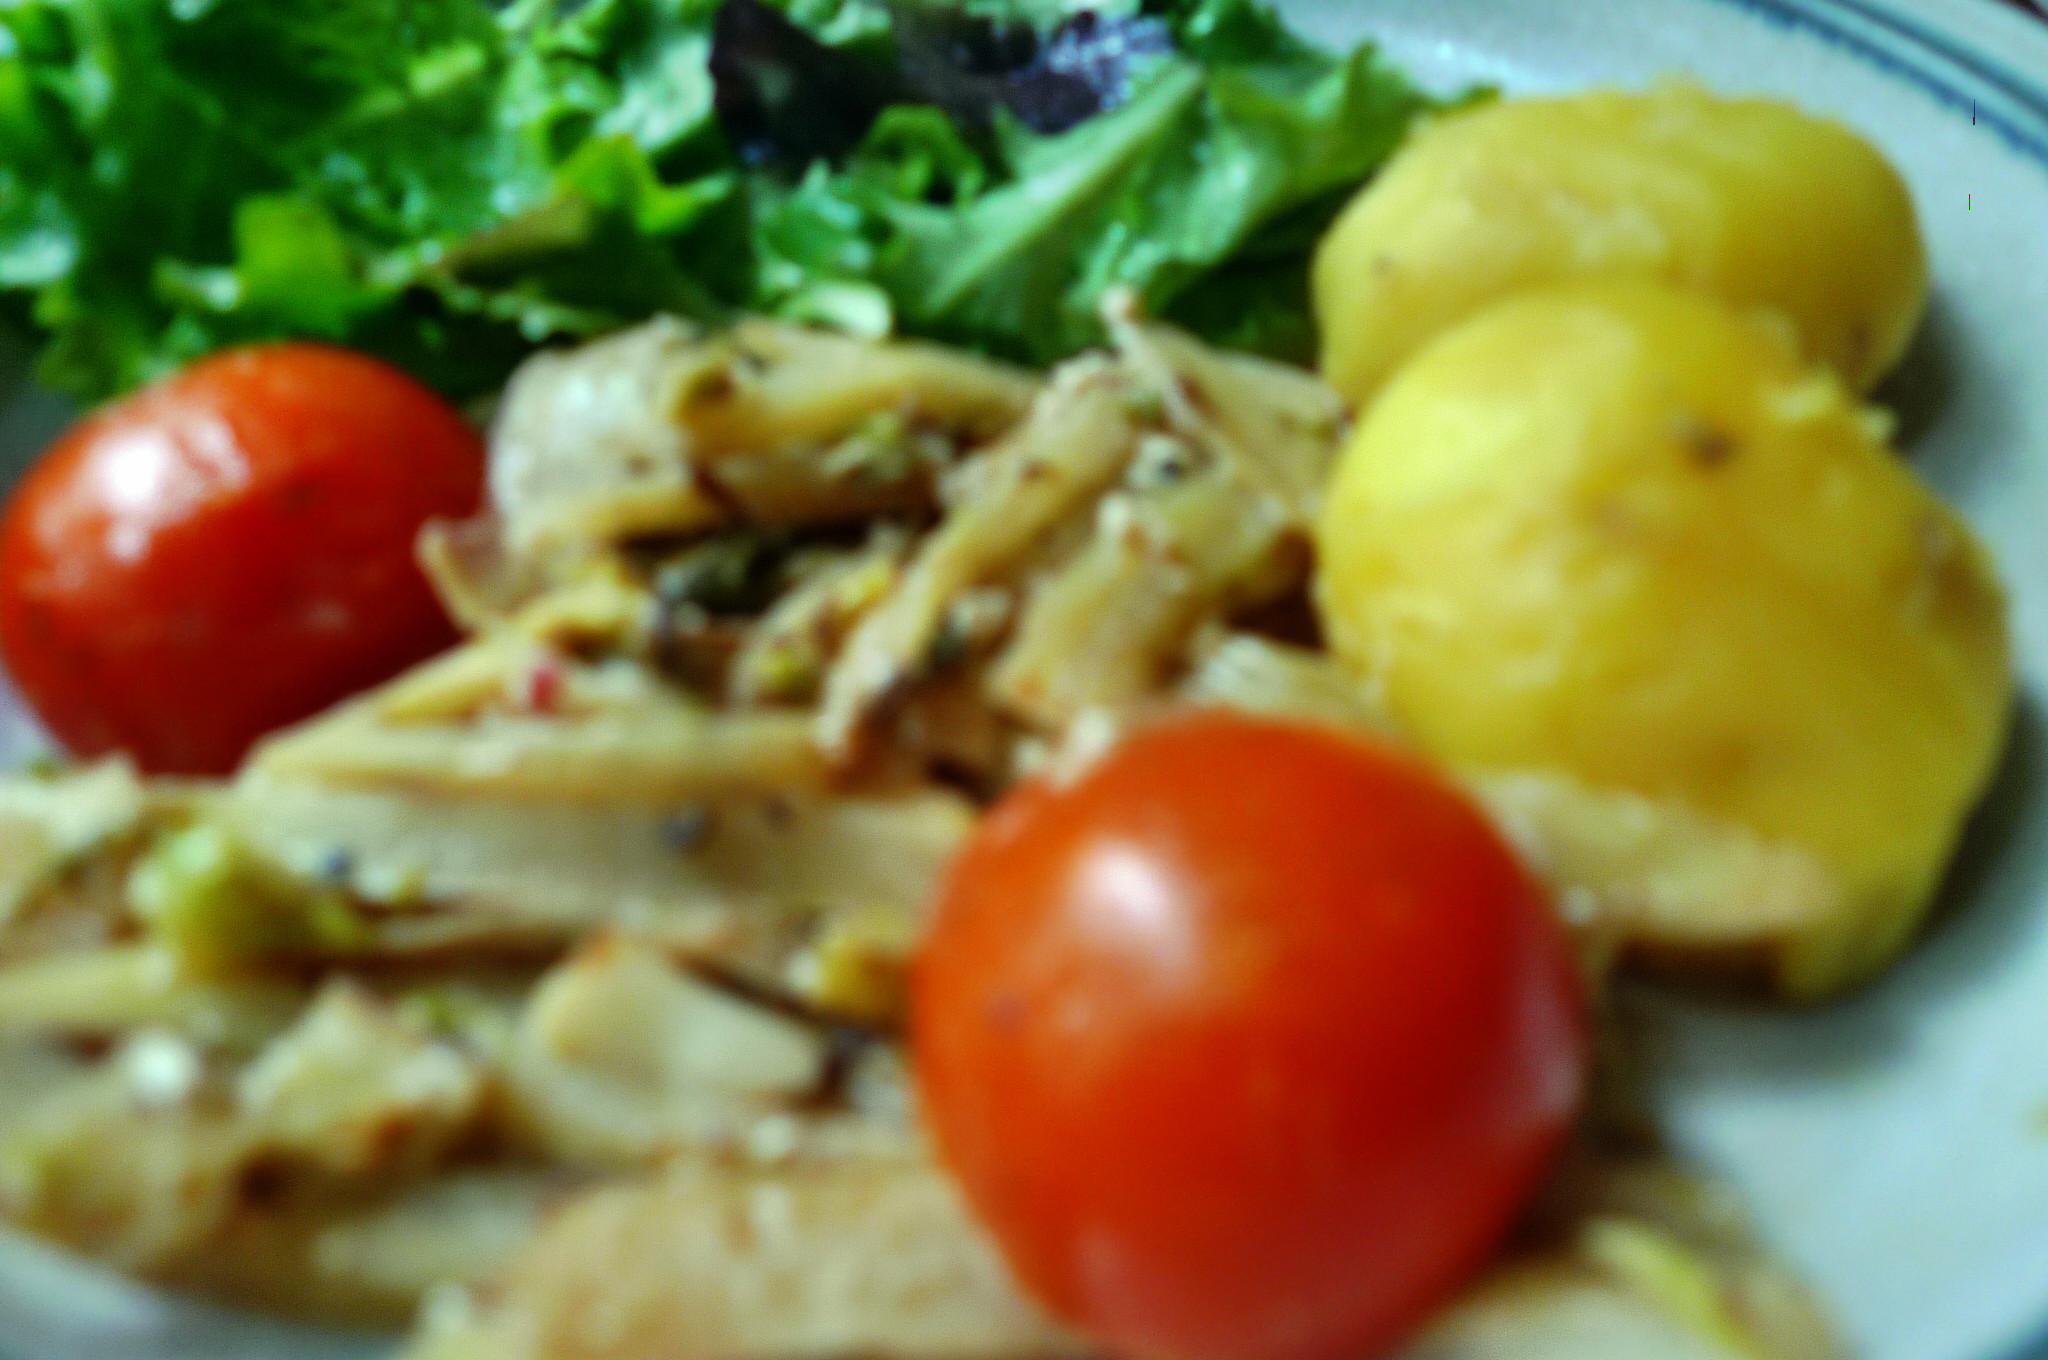 Fenchelgemüse,Kartoffeln,Salat -8..15   (14)